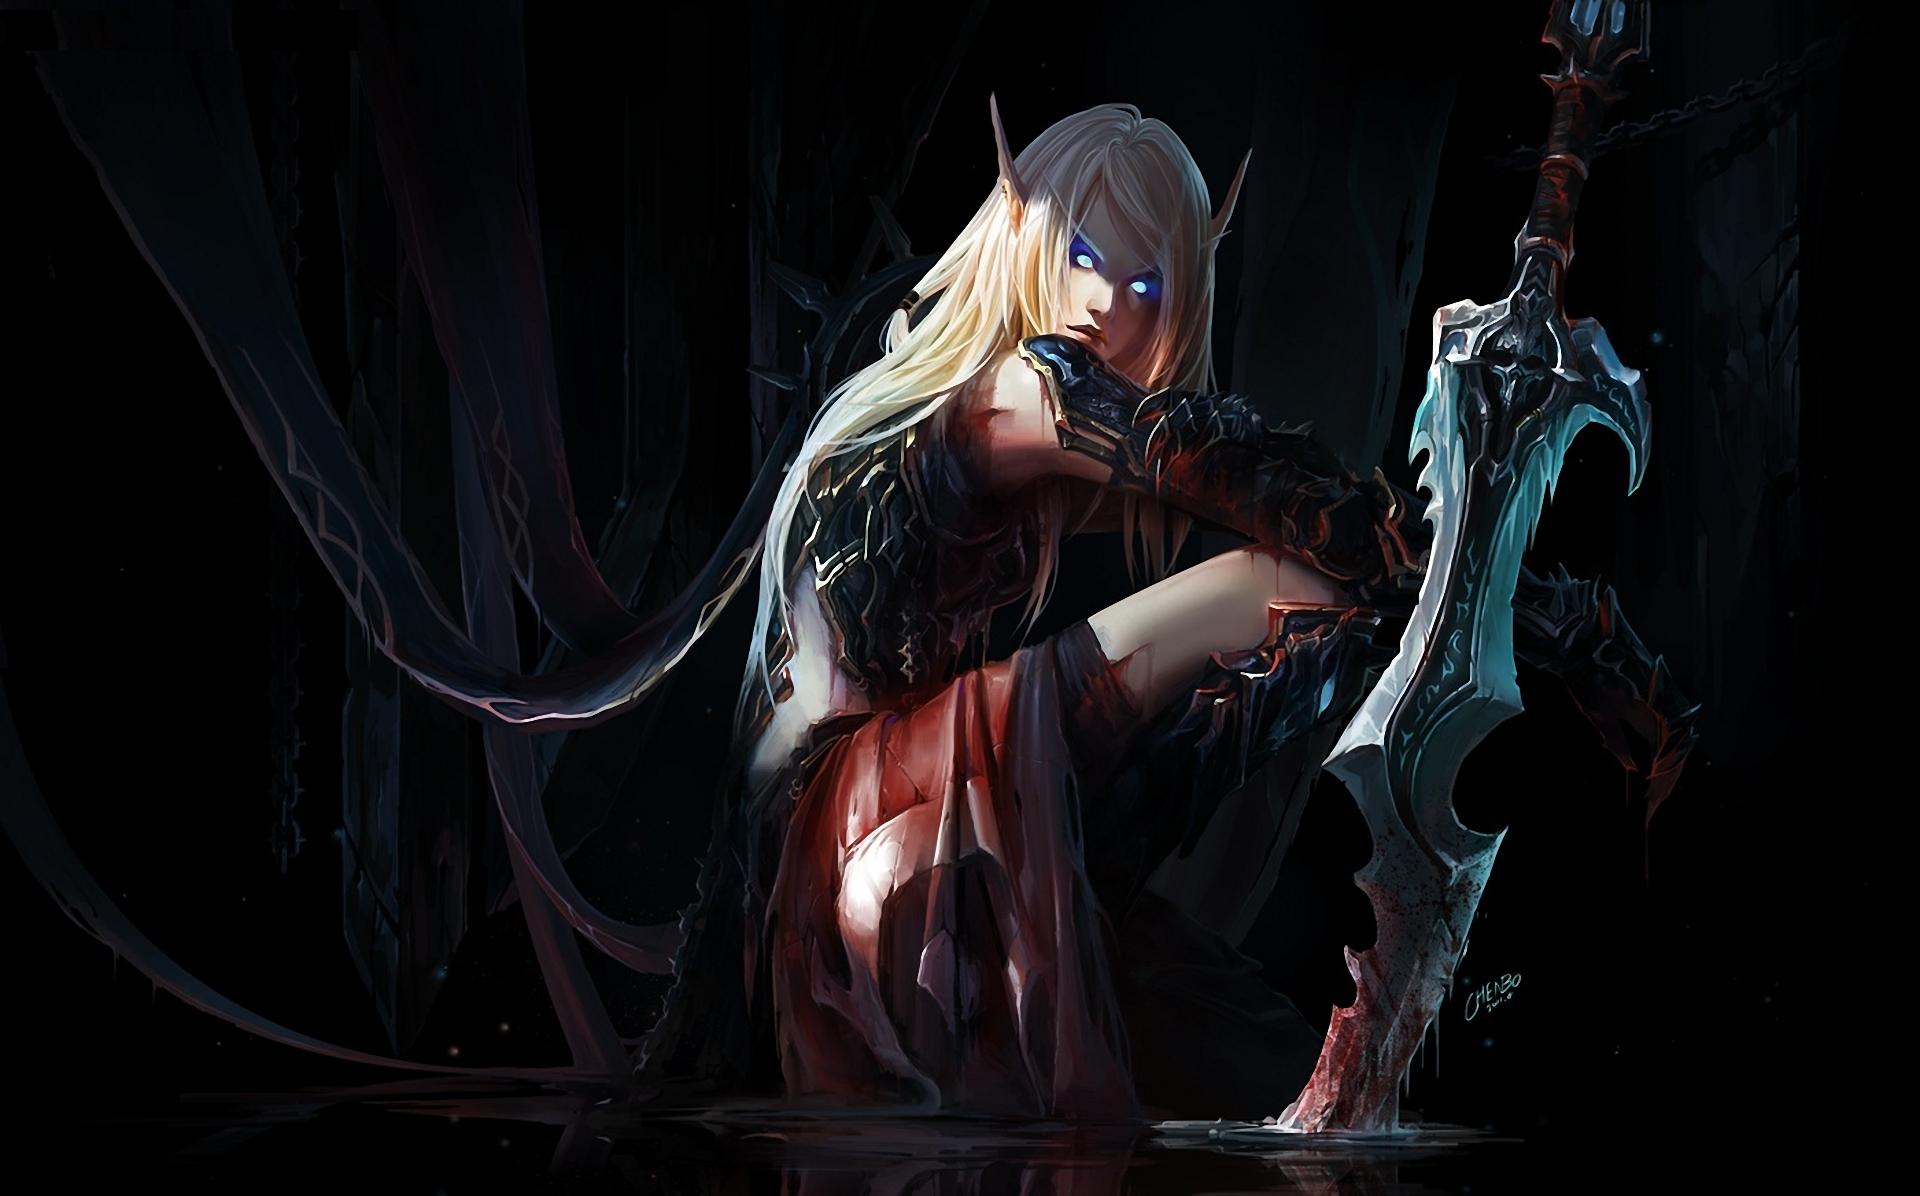 images?q=tbn:ANd9GcQh_l3eQ5xwiPy07kGEXjmjgmBKBRB7H2mRxCGhv1tFWg5c_mWT Ideas For Anime Art Elf Girl @koolgadgetz.com.info